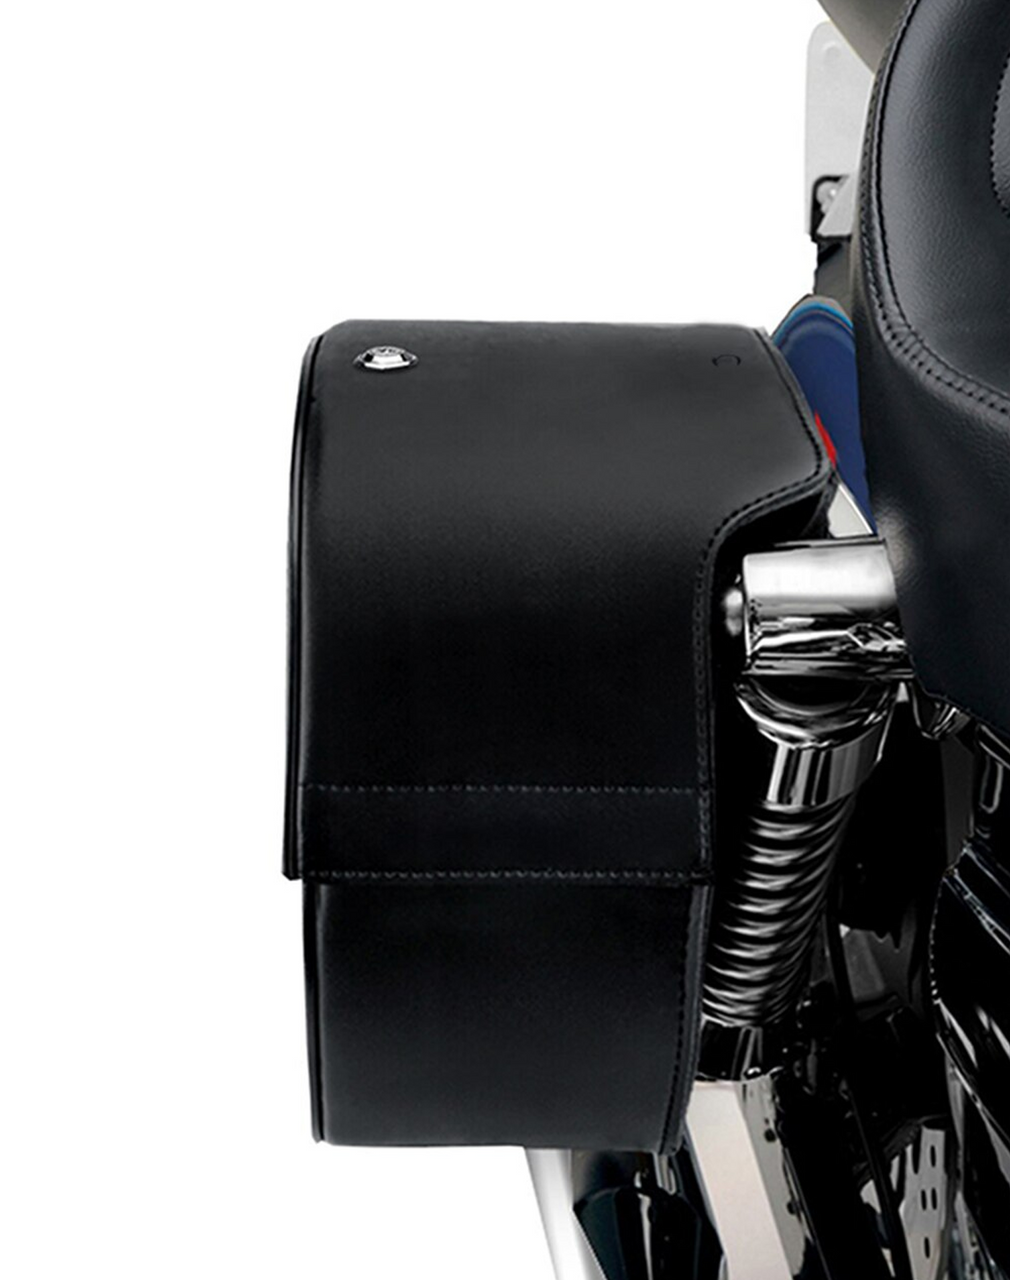 Honda 1500 Valkyrie Interstate Vikingbags Shock Cutout Single Strap Large Slanted Leather Motorcycle Saddlebags Shock Cutout View